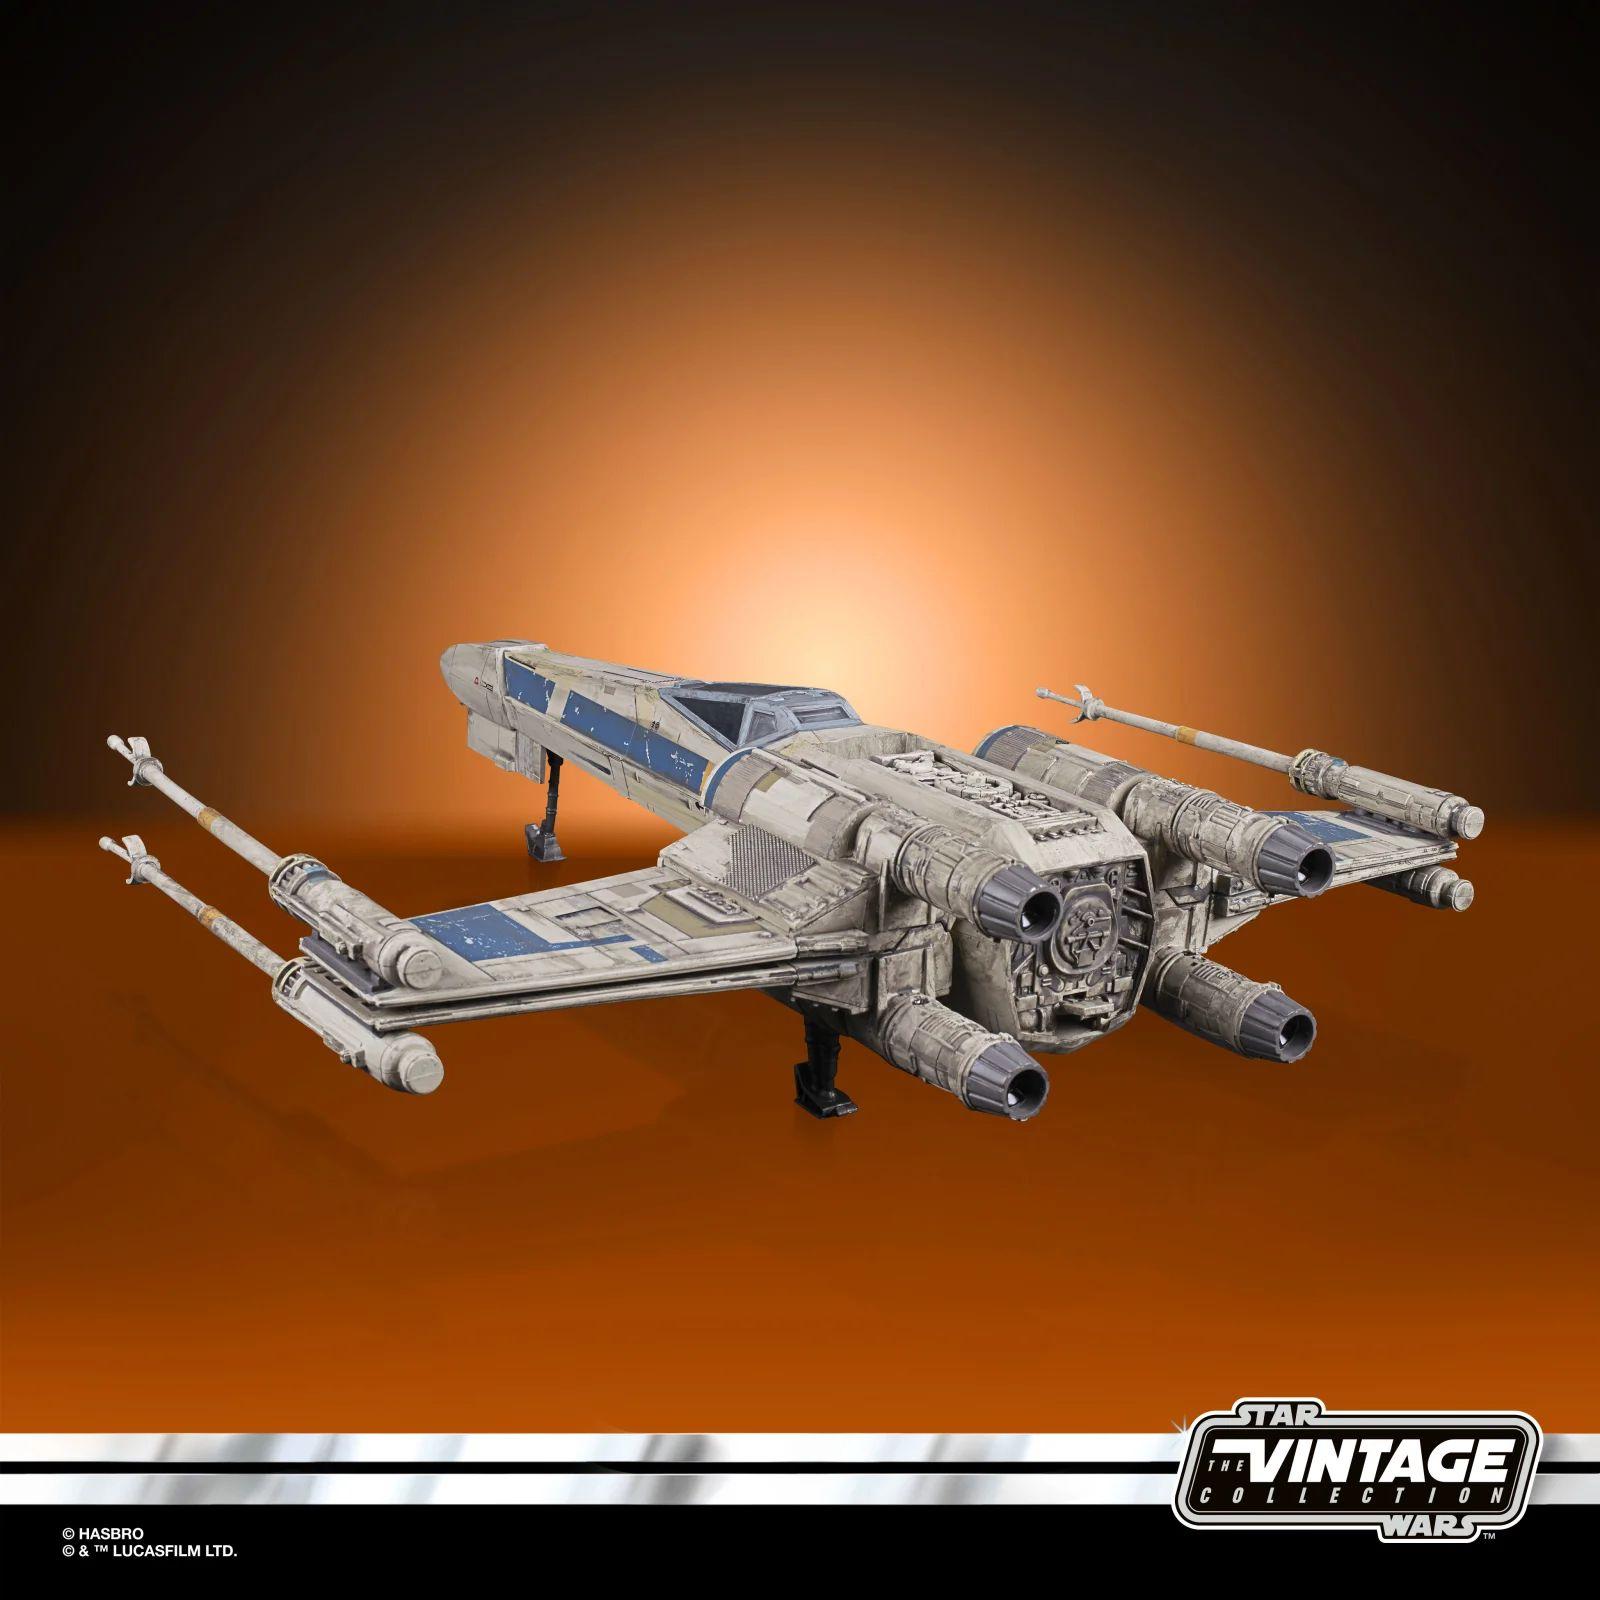 VC-General-Antoc-Merrick-s-X-Wing-Fighter-RO-Loose-3.jpg